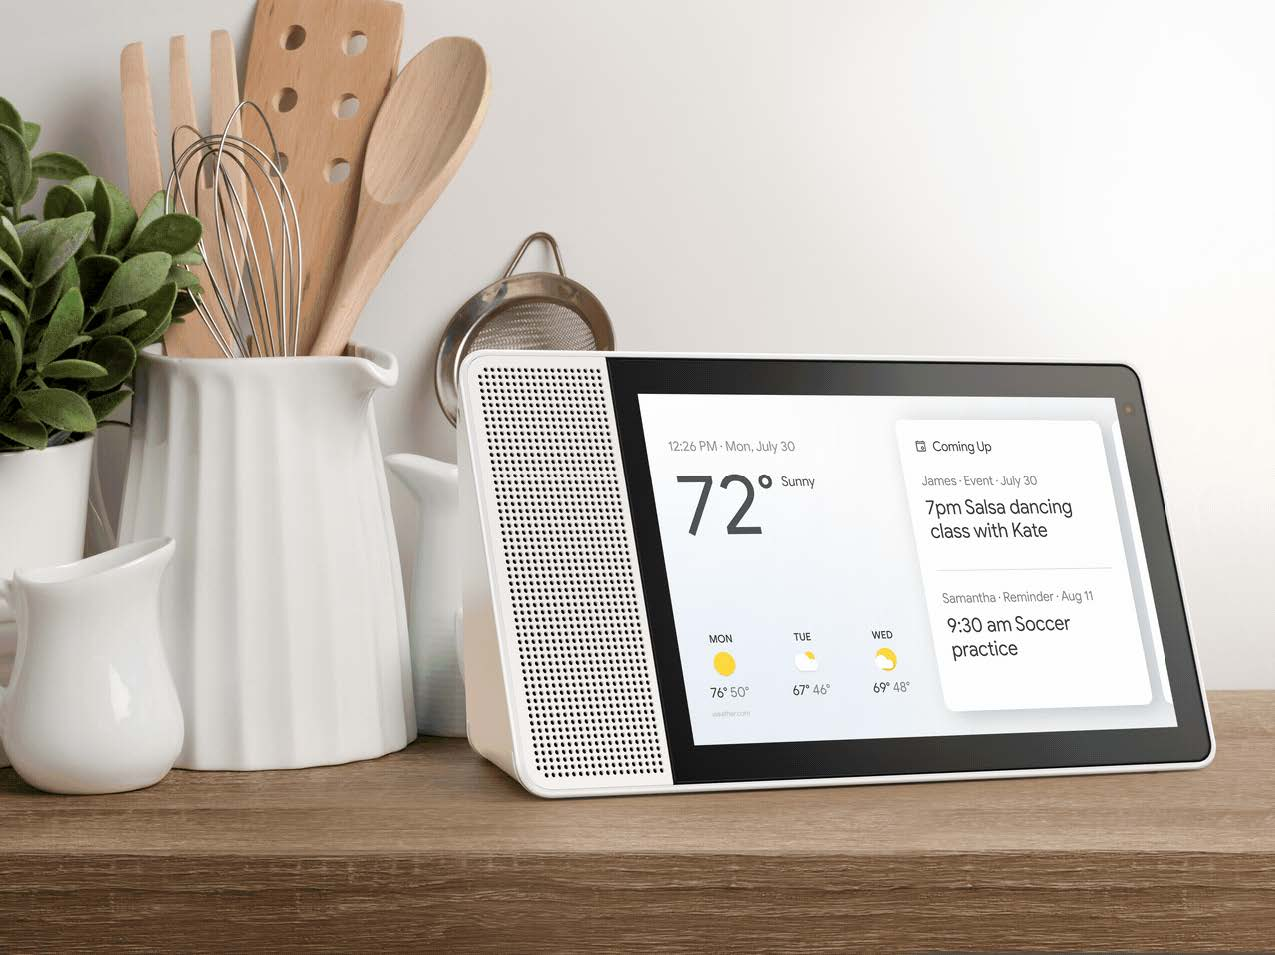 lenovo hub SmartHouse Best Of The Best Awards 2020: Smart Home Management